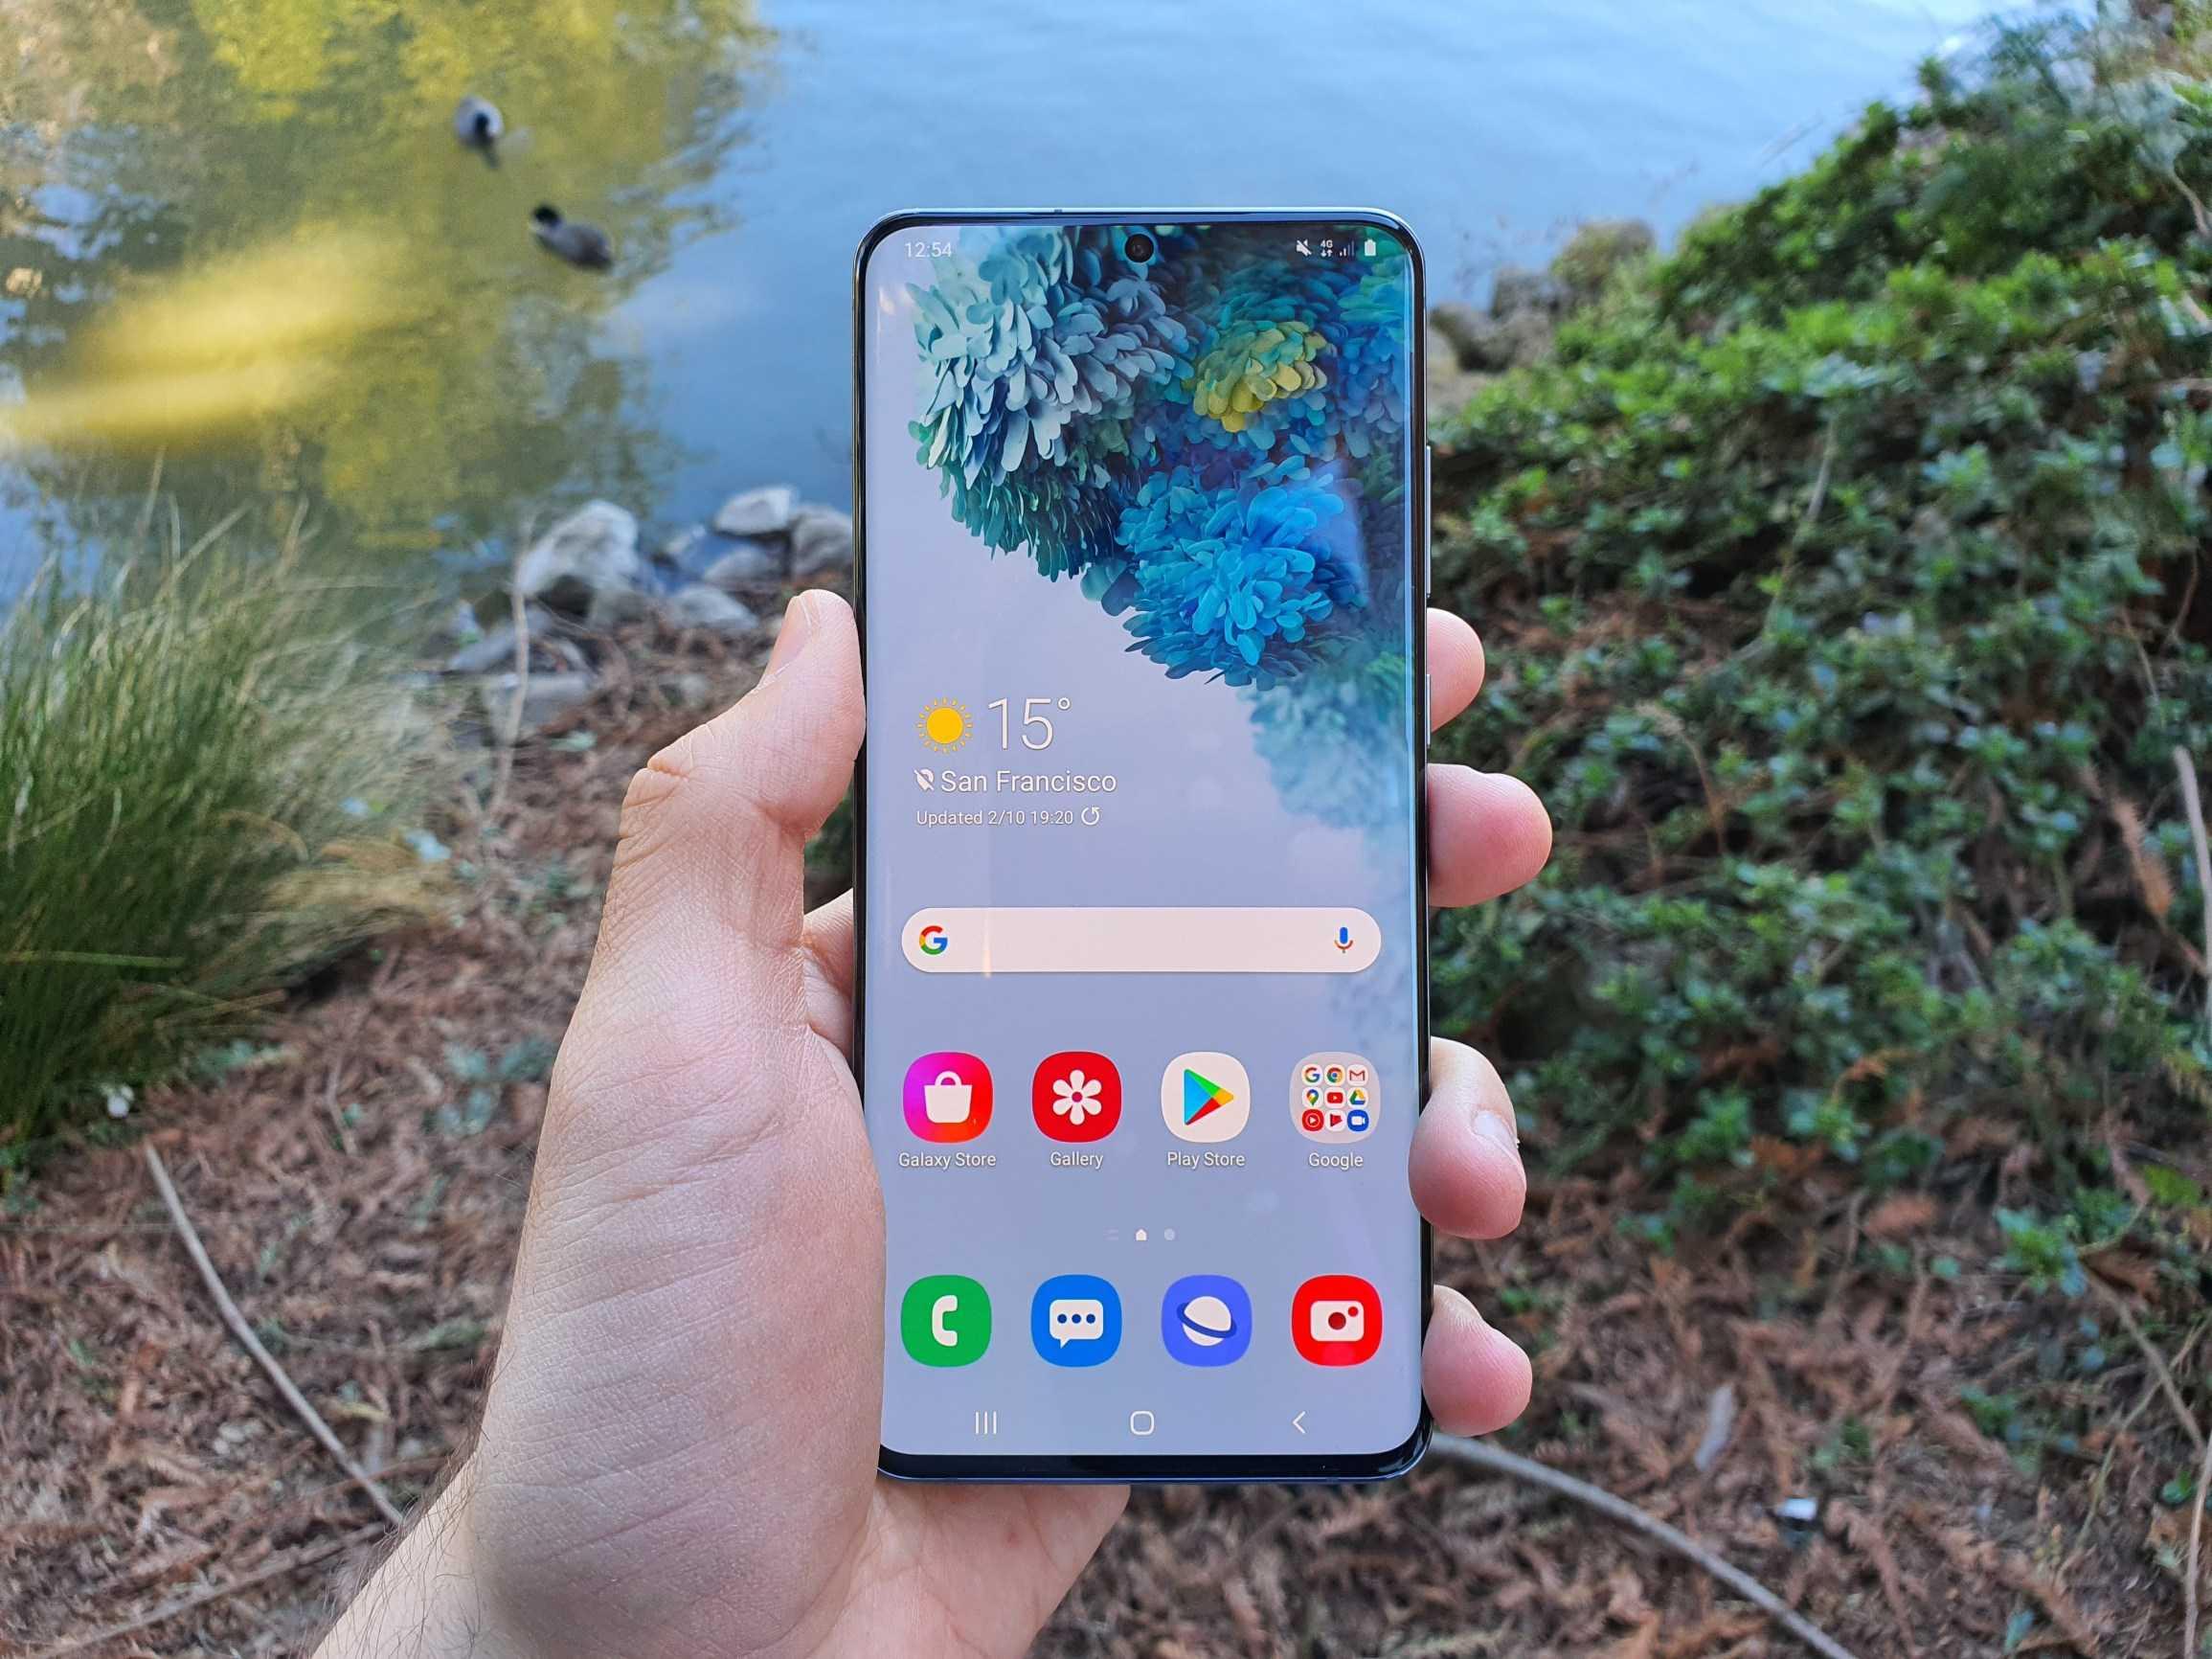 Samsung galaxy s20+ (exynos) camera review